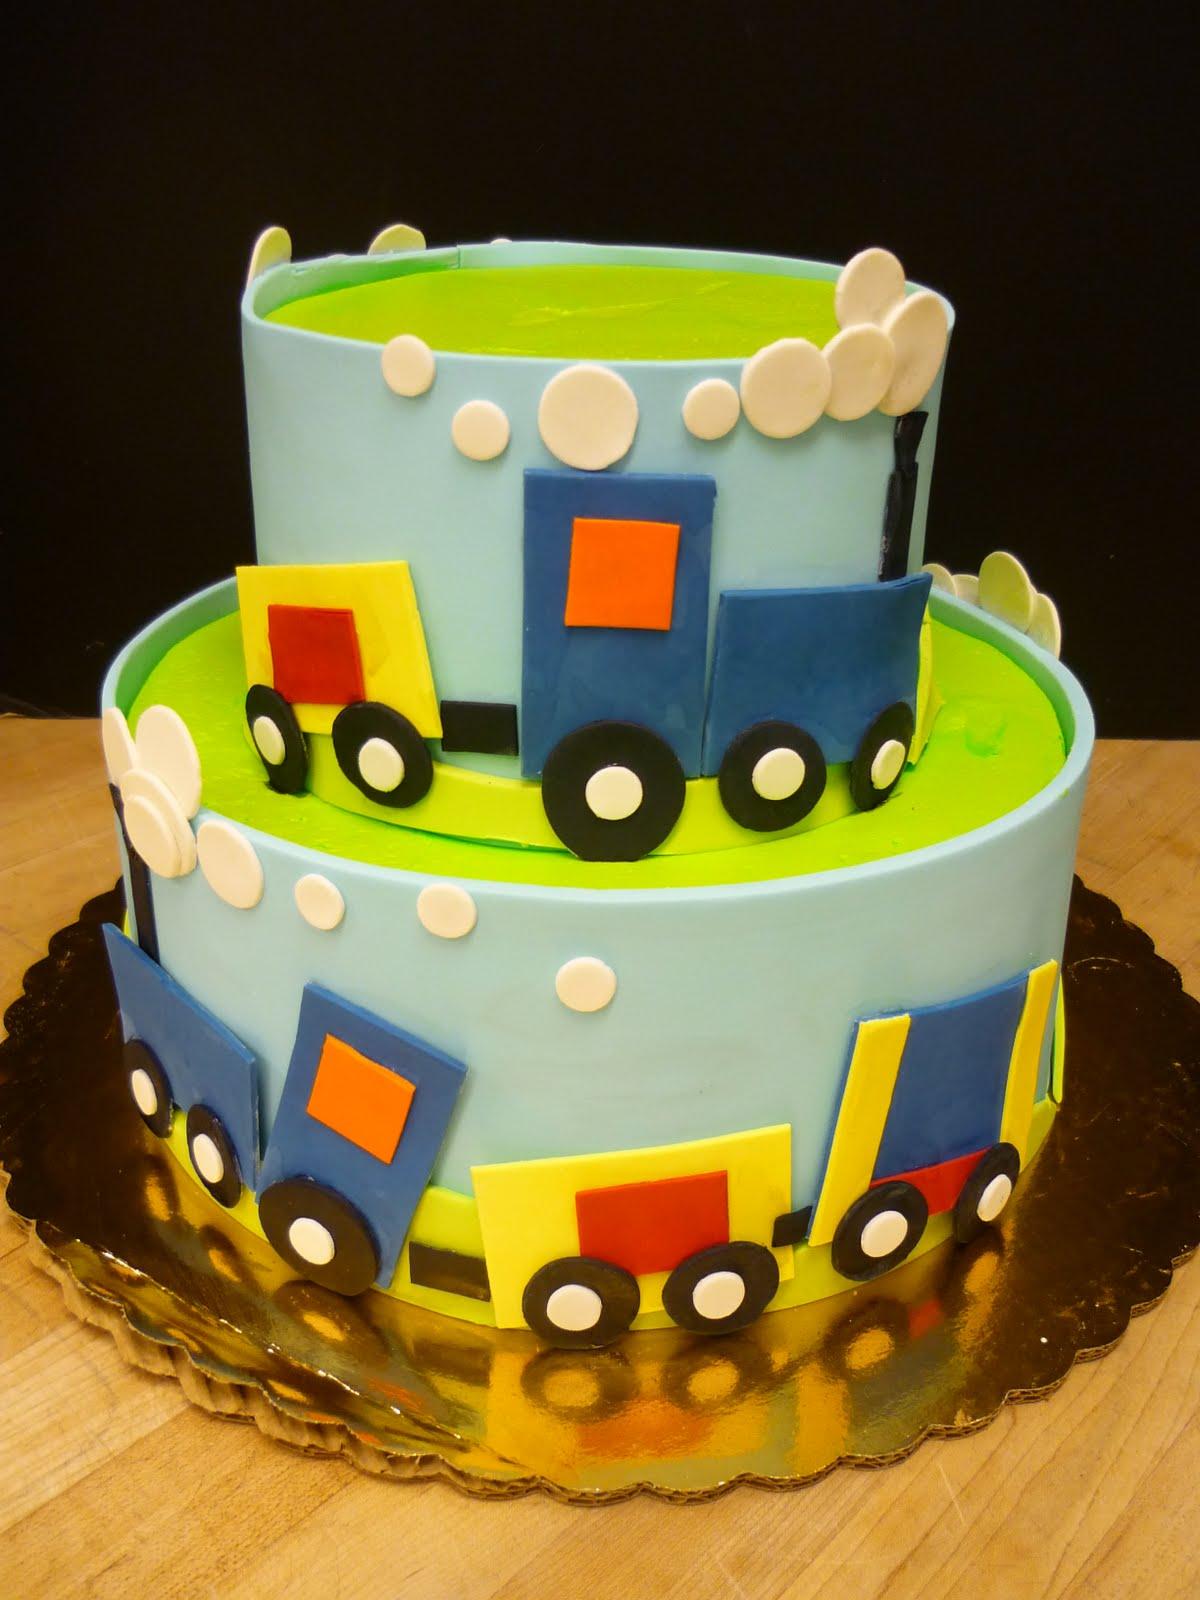 Fabulous 11 House Boys Birthday Cakes Photo Boys Birthday Cake Ideas 7 Funny Birthday Cards Online Alyptdamsfinfo